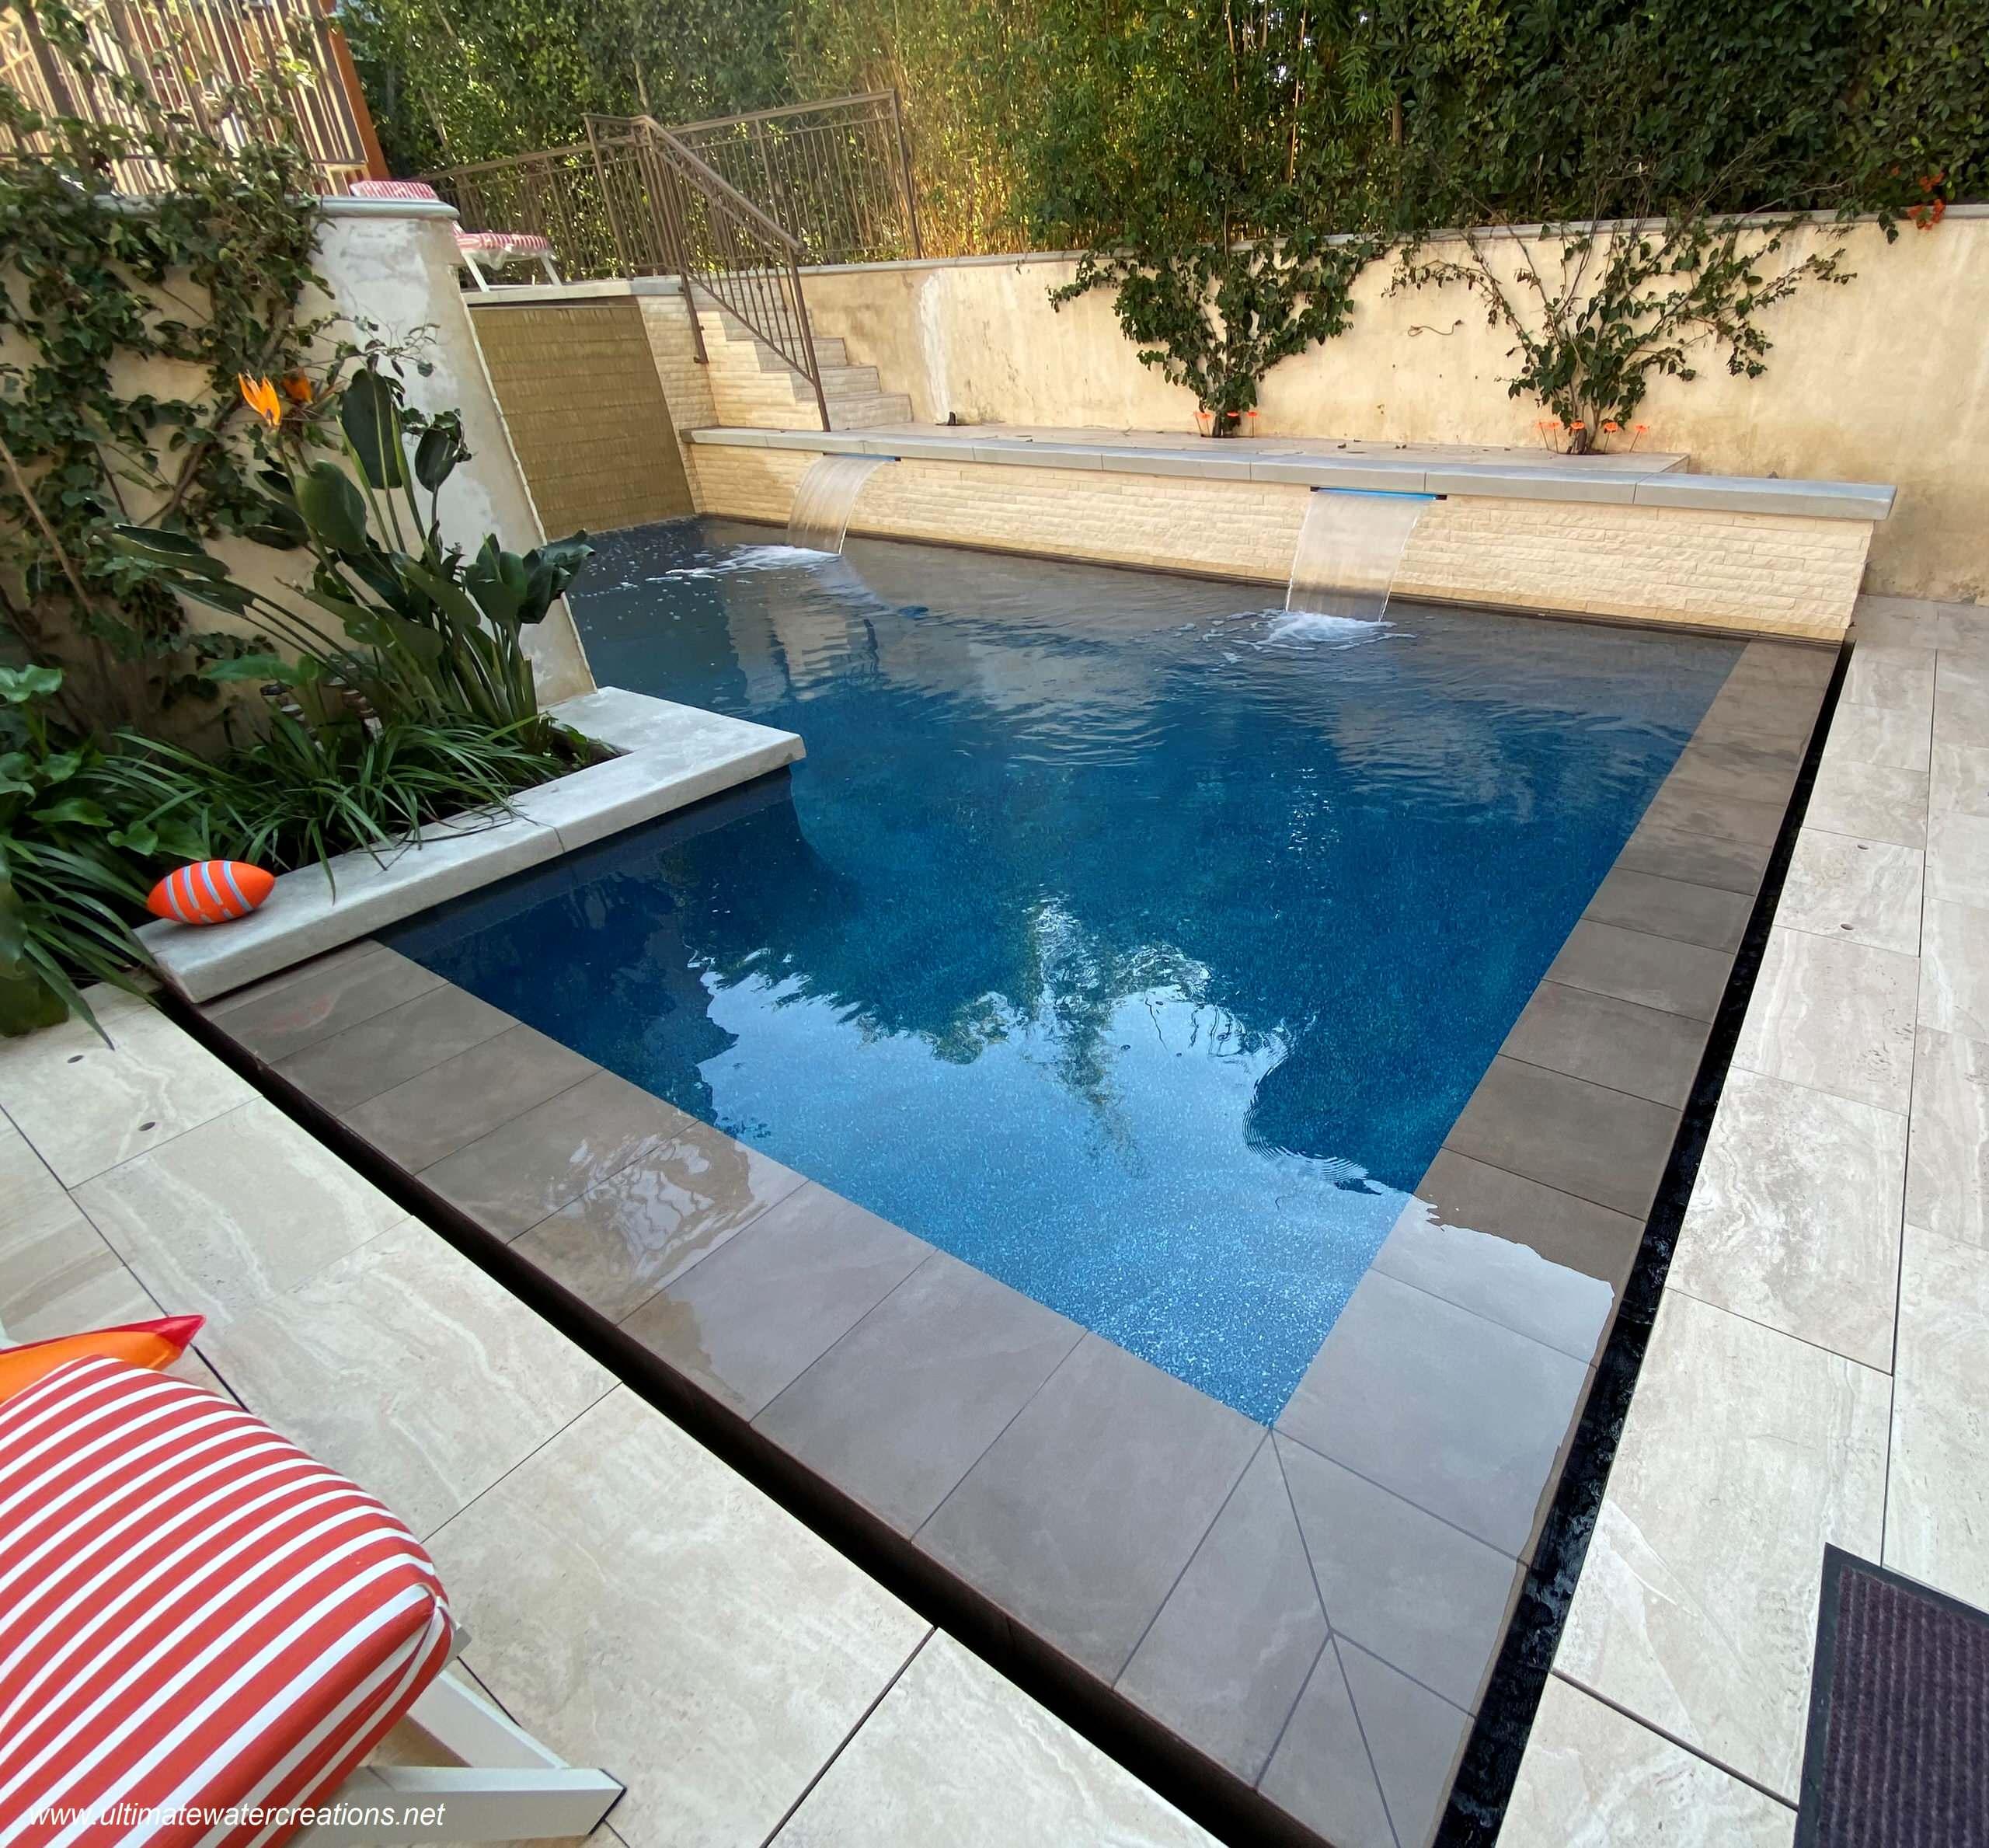 Manhattan Beach - Contemporary Pool & Spa in Compact Courtyard area